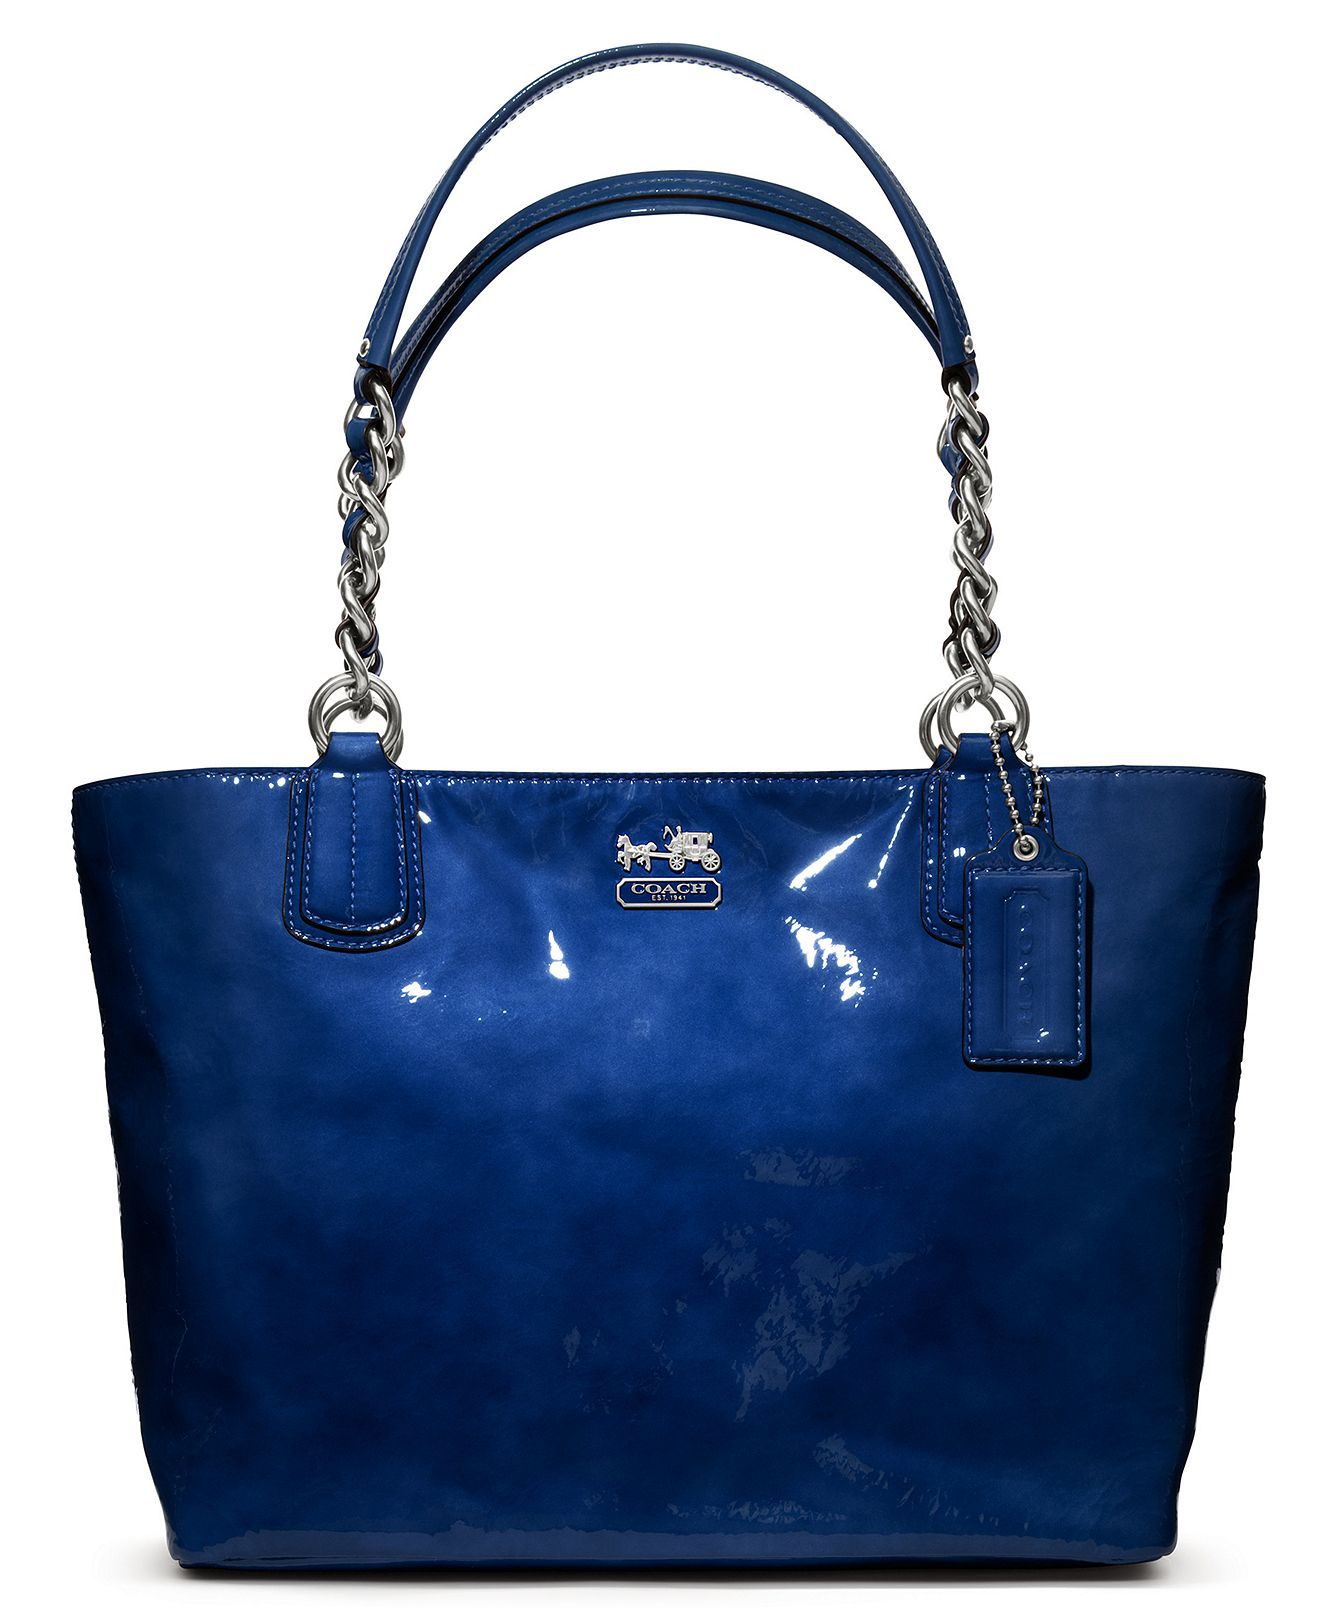 e9dfaa2ca0 COACH MADISON PATENT TOTE - Coach Handbags - Handbags   Accessories - Macy s